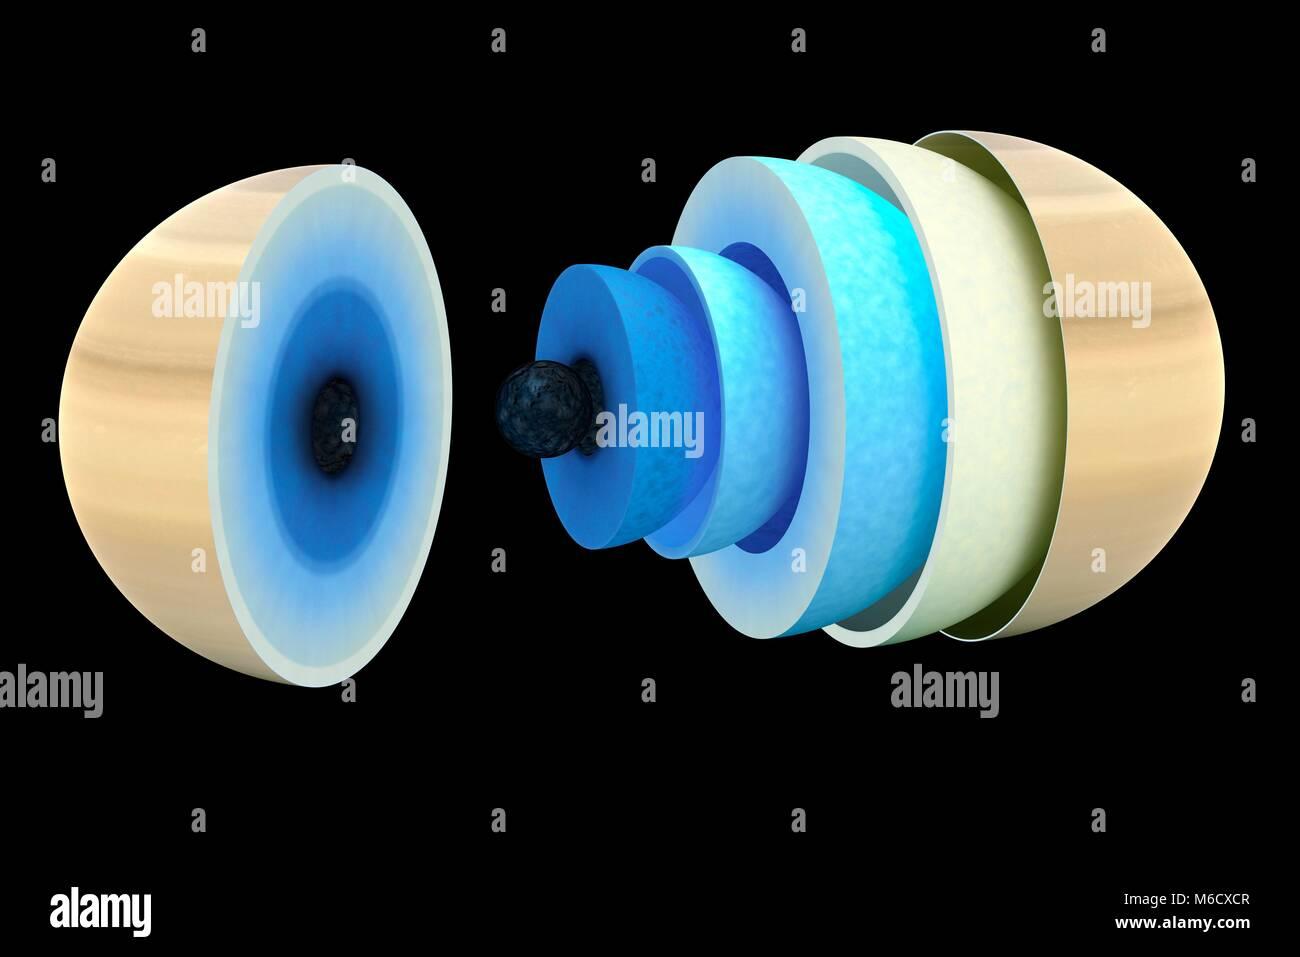 diagram showing the theoretical interior of the gas giant planet rh alamy com Saturn Core Venus Diagram